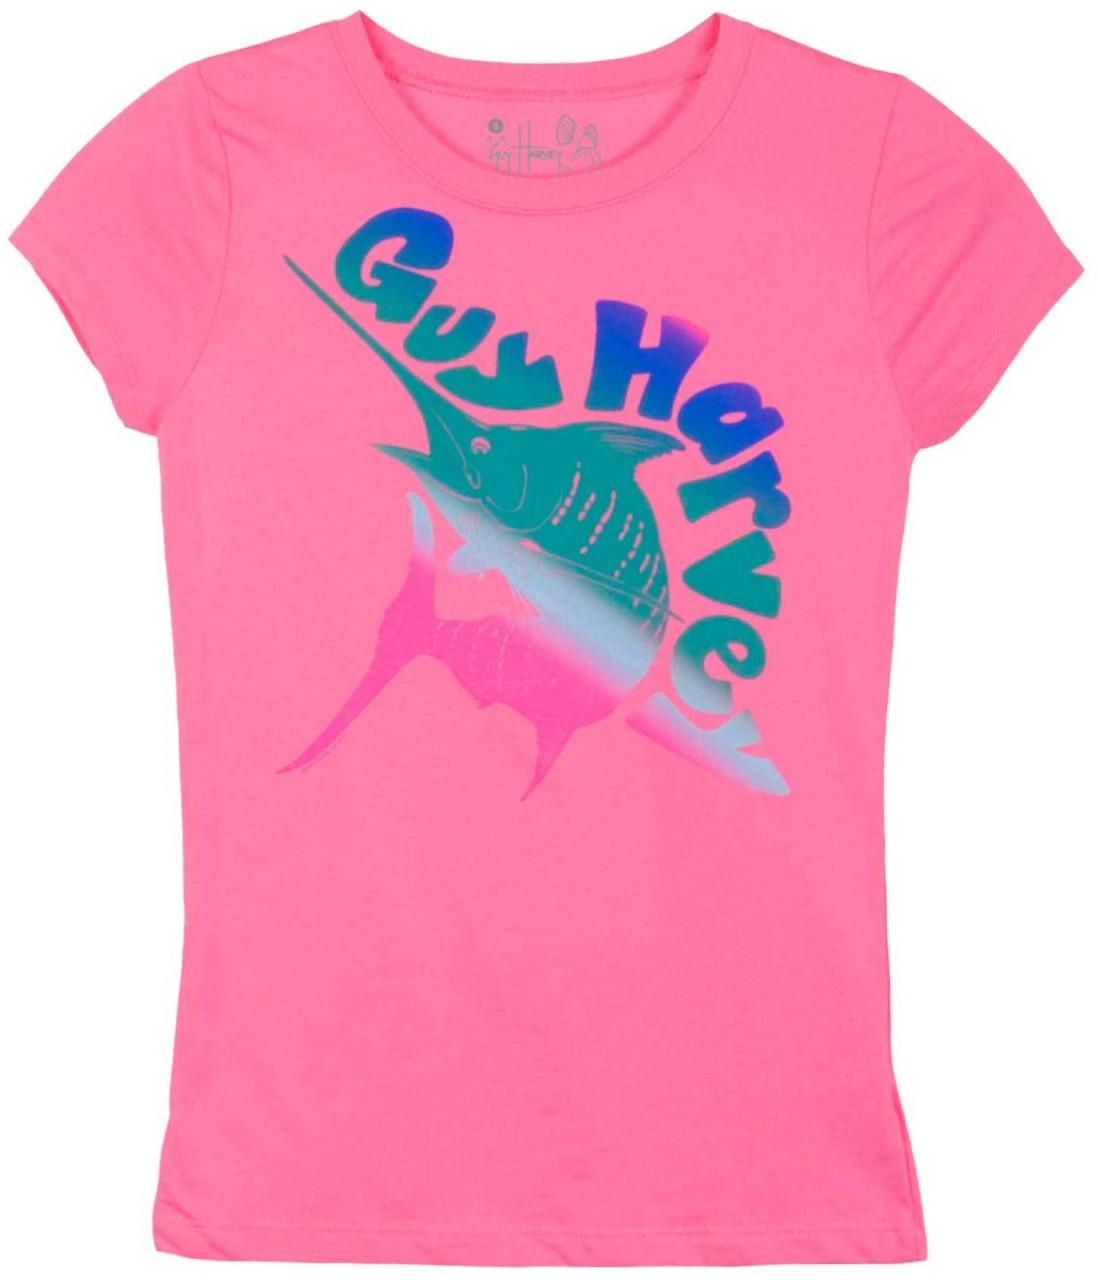 e068b5e1e5a0 Pink Guy Harvey Shirts - DREAMWORKS